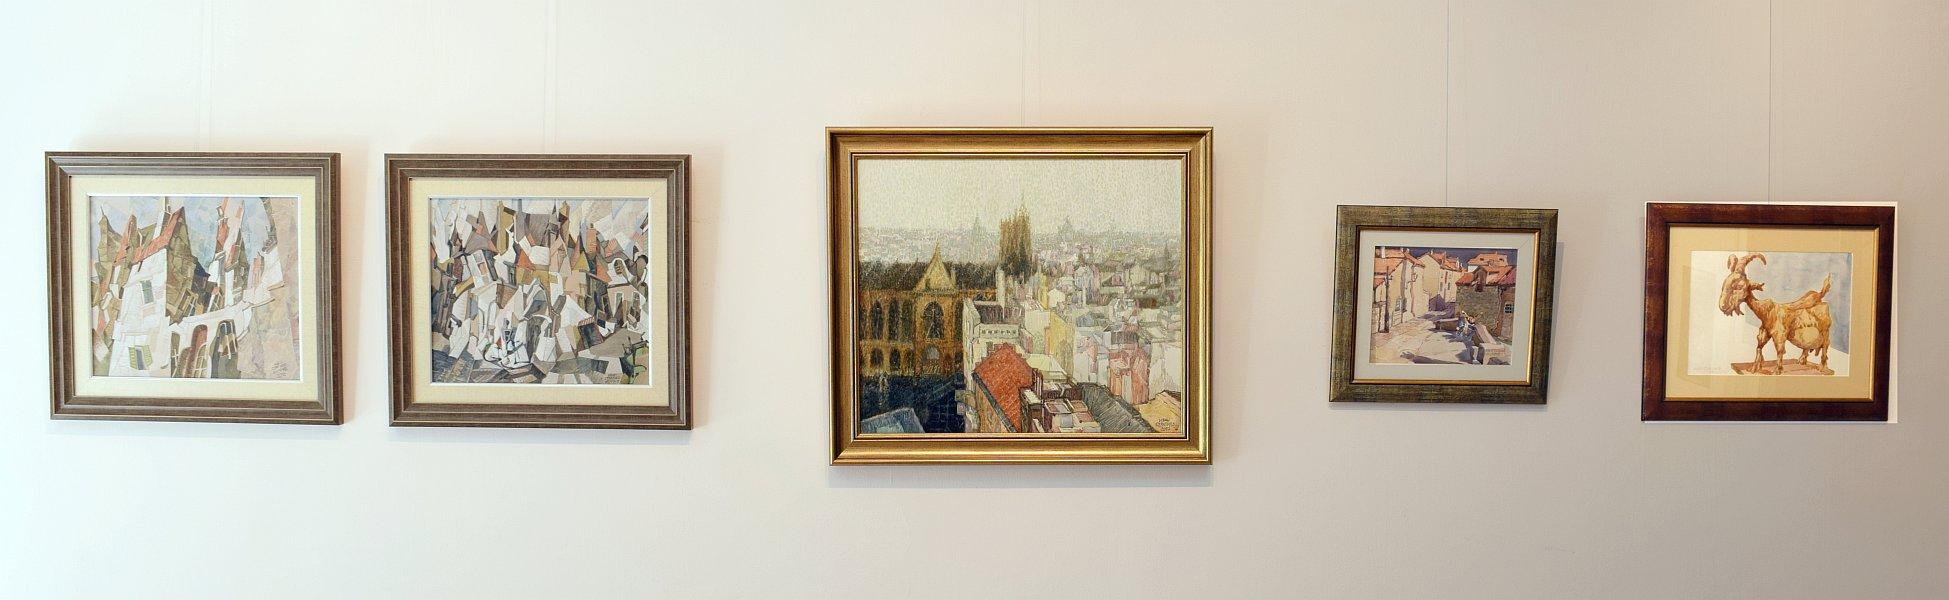 Izlozhba na Ivan Stratiev - galeria Paris-2017